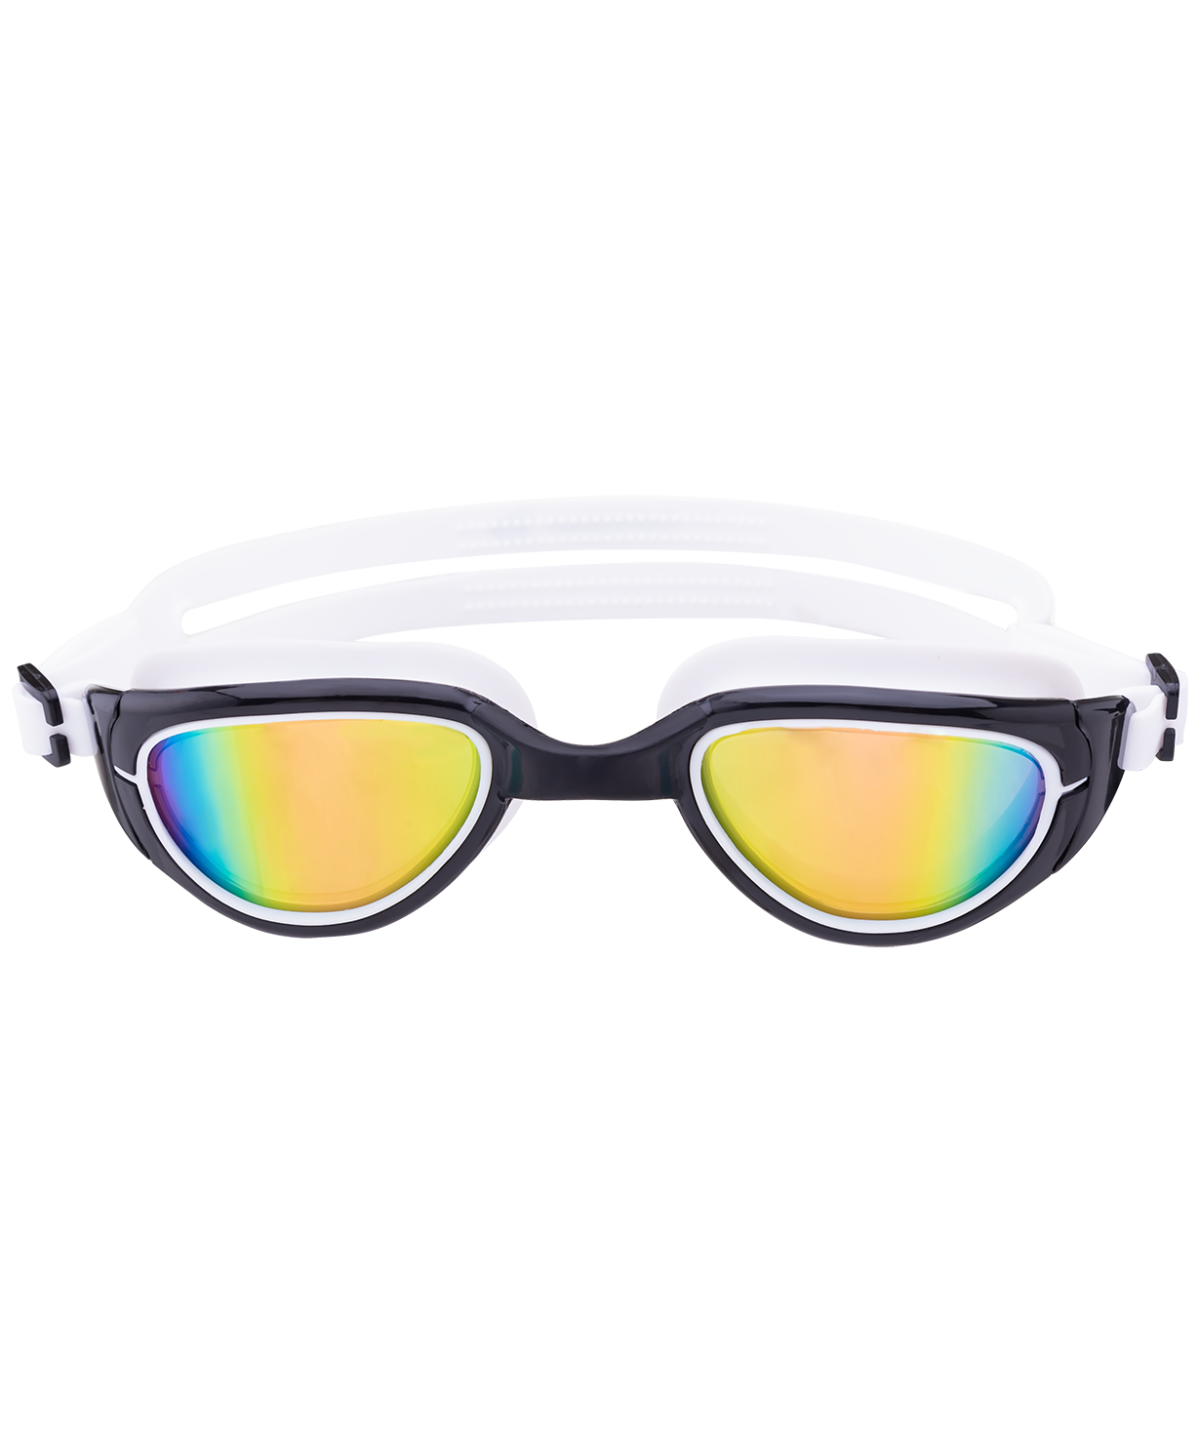 LONGSAIL Blaze Mirror Очки для плавания  L011707 - 2